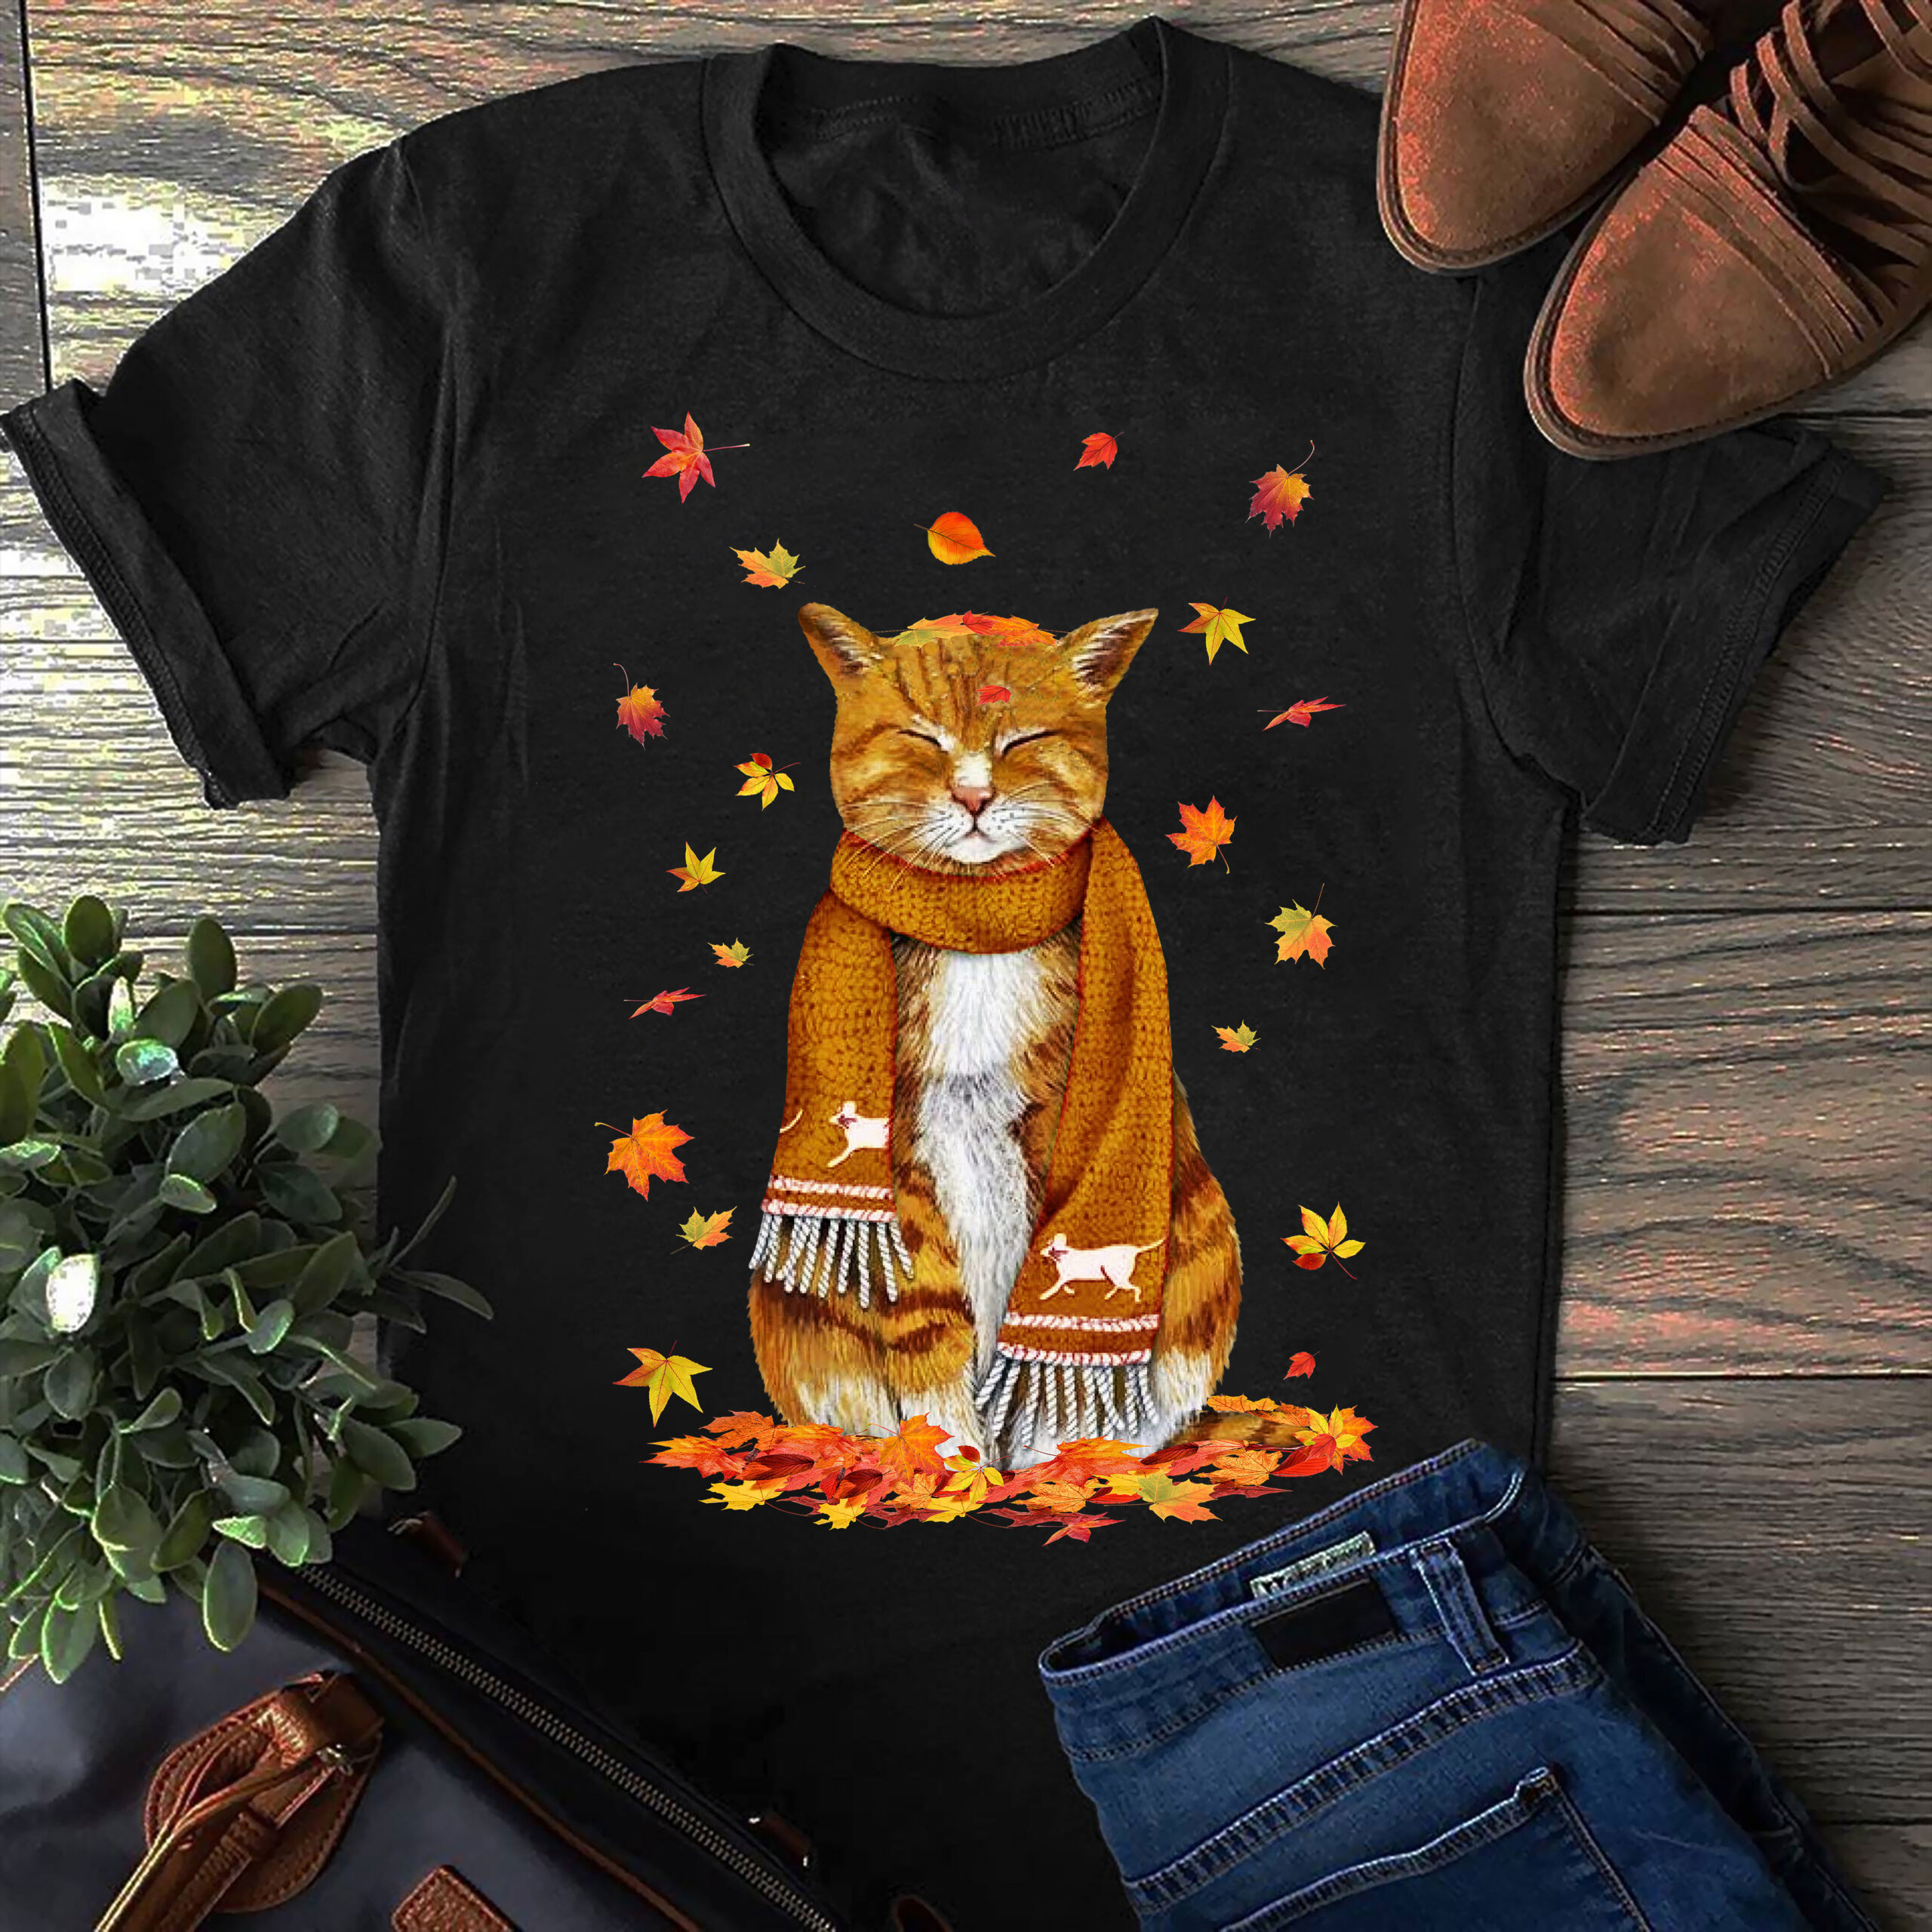 Autumn Cat Wearing Scarf Shirt